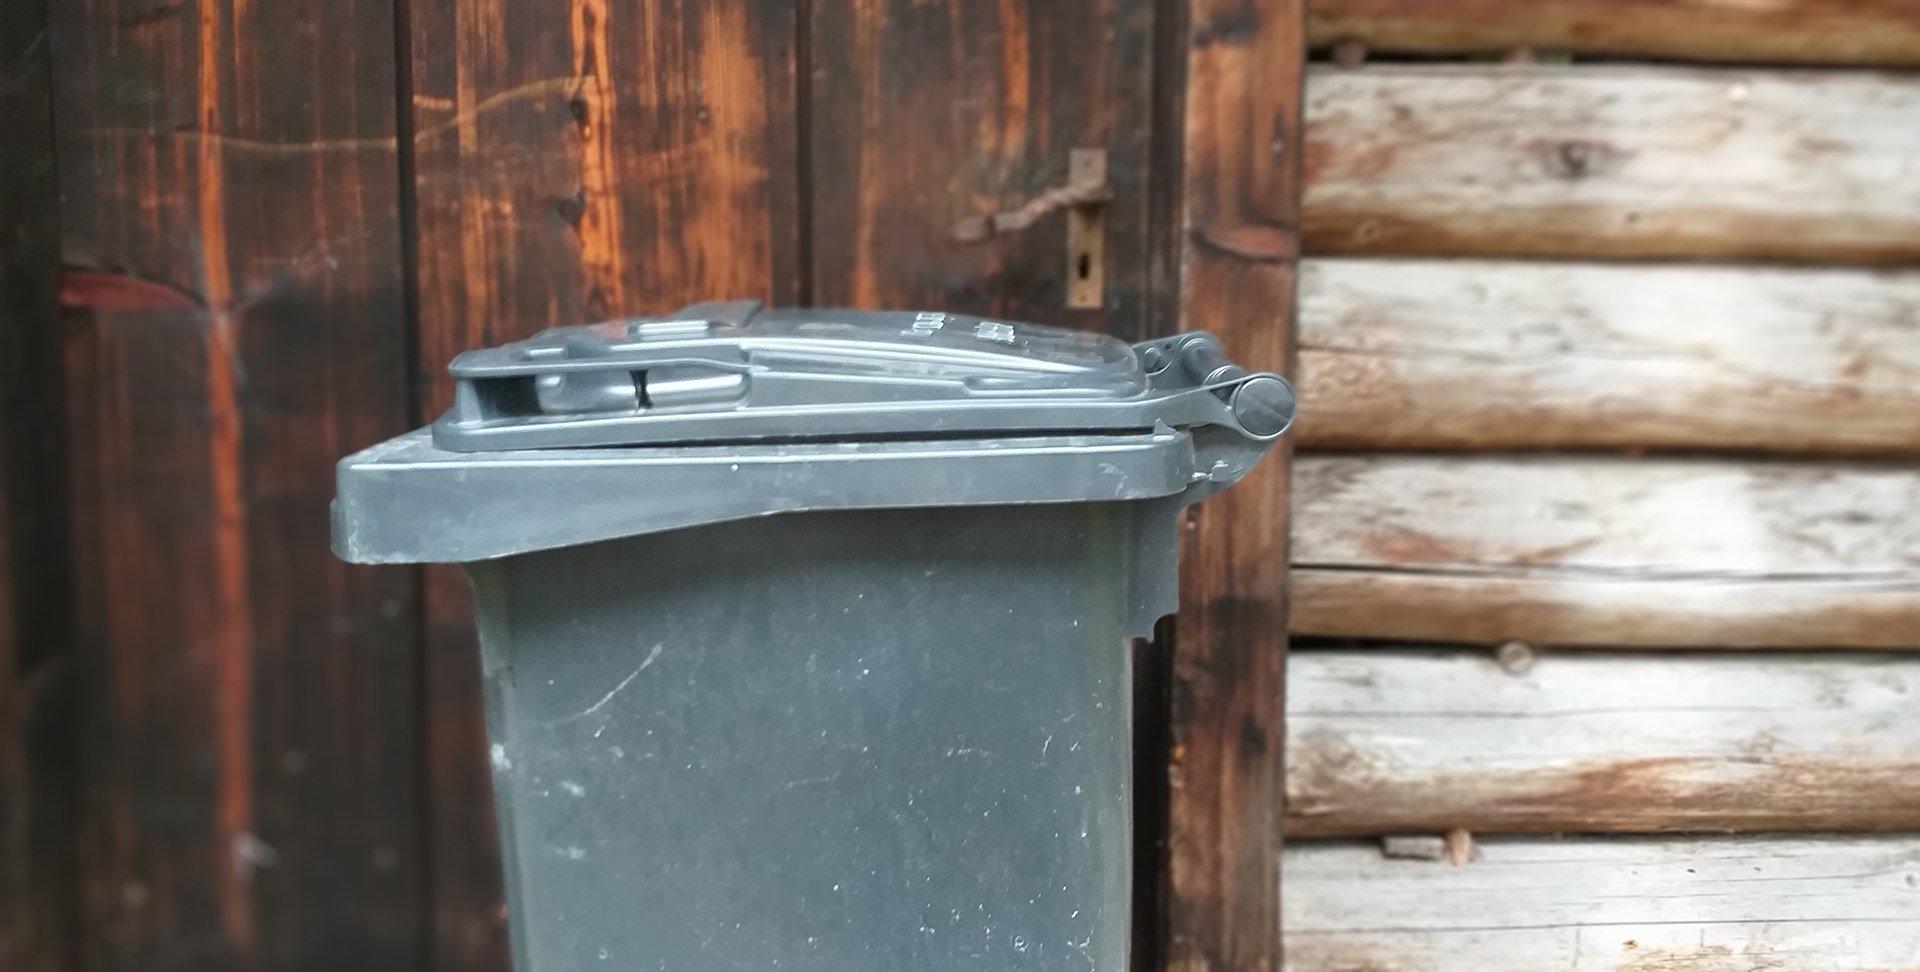 Entsorgung Müll, © Gemeinde Grainau / E. Reindl